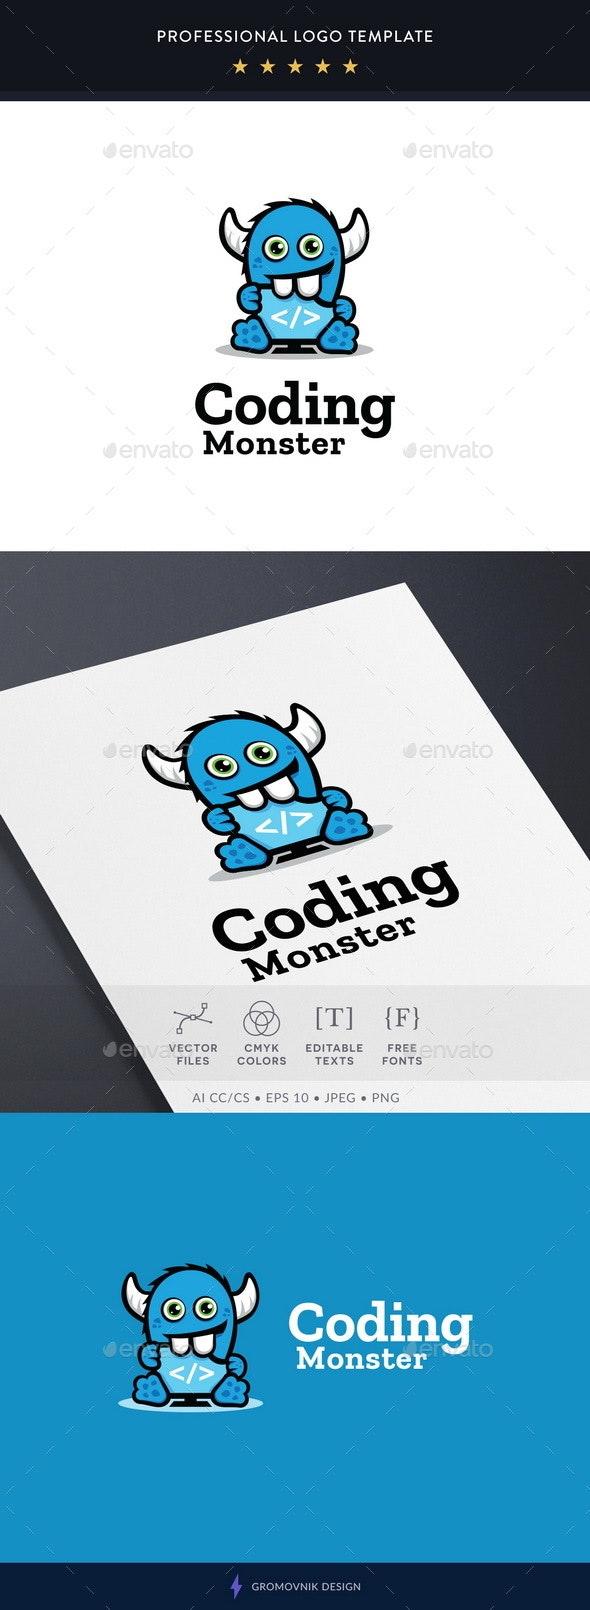 Coding Monster Logo Template - Abstract Logo Templates